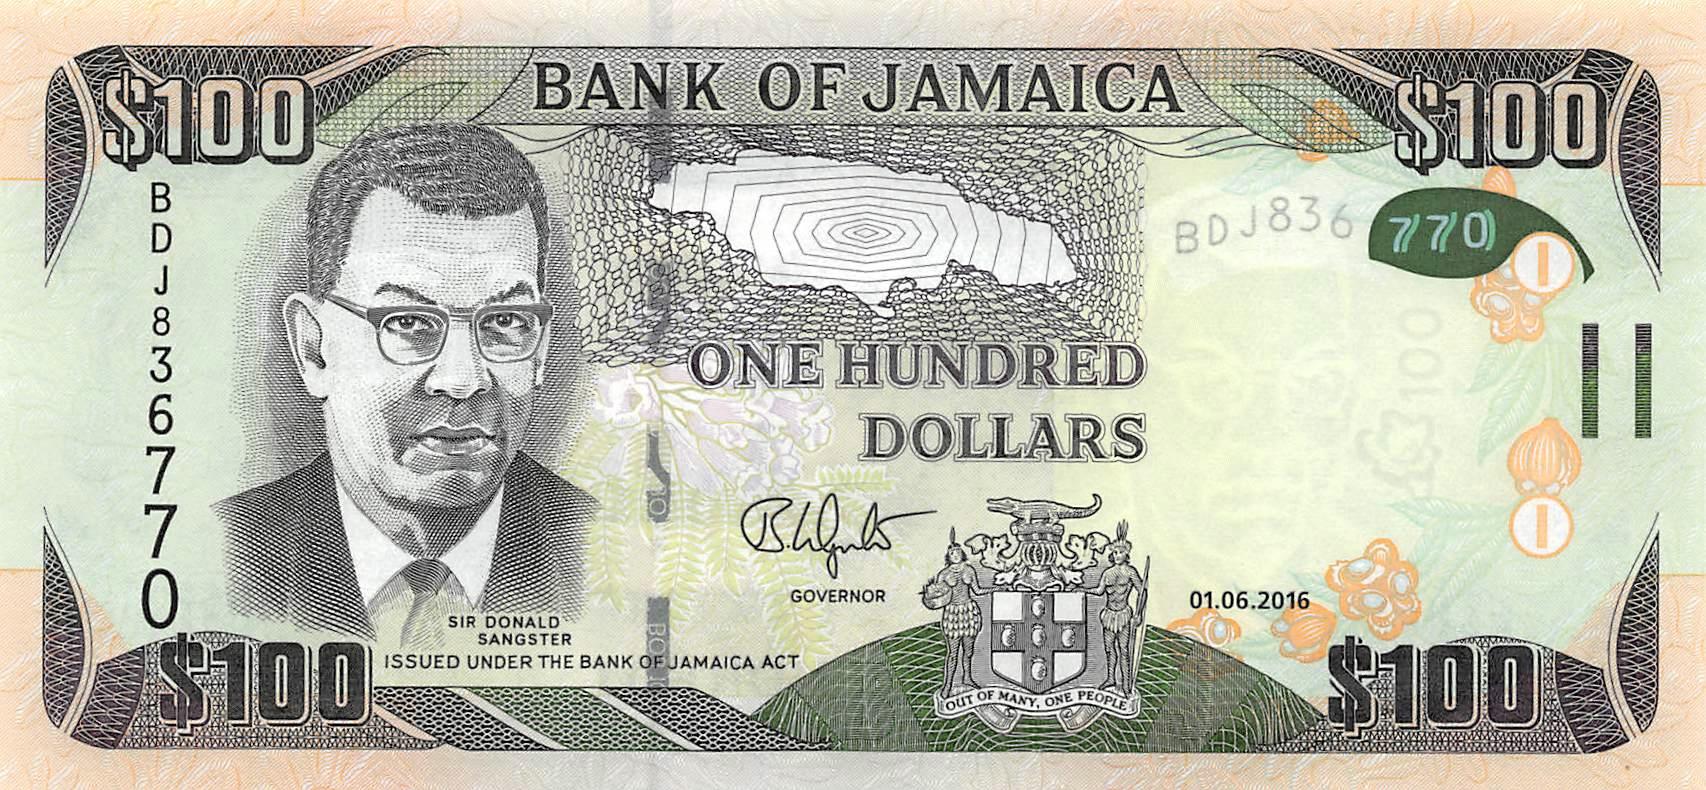 JAMAICA 50 DOLLARS 2013 P 94 HYBRID G/&D UNC